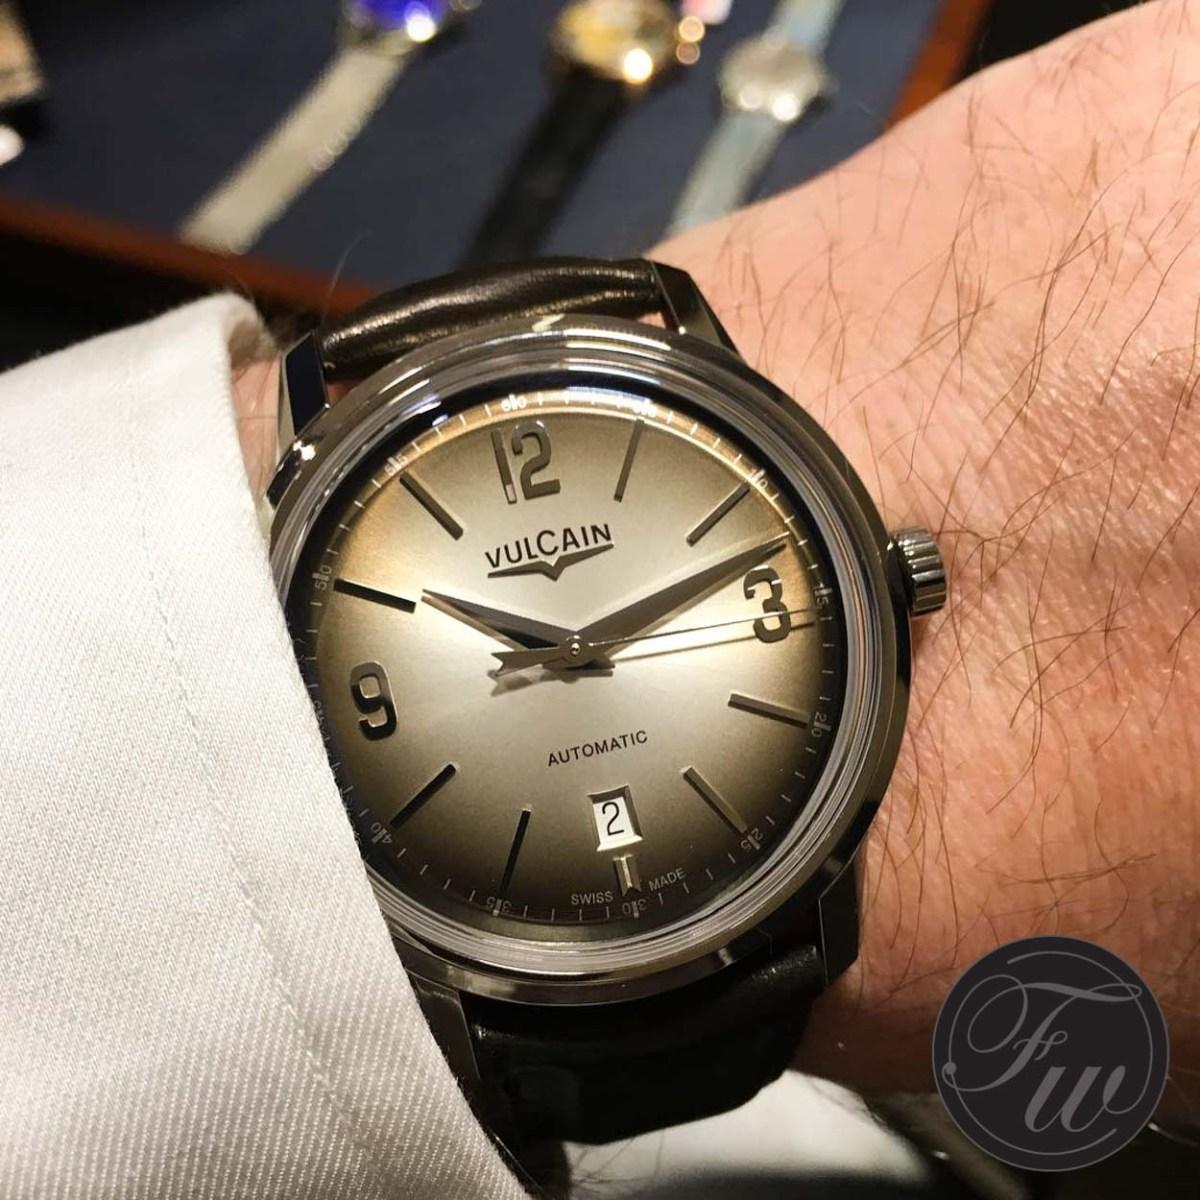 Vulcain Presidents Classic Watch